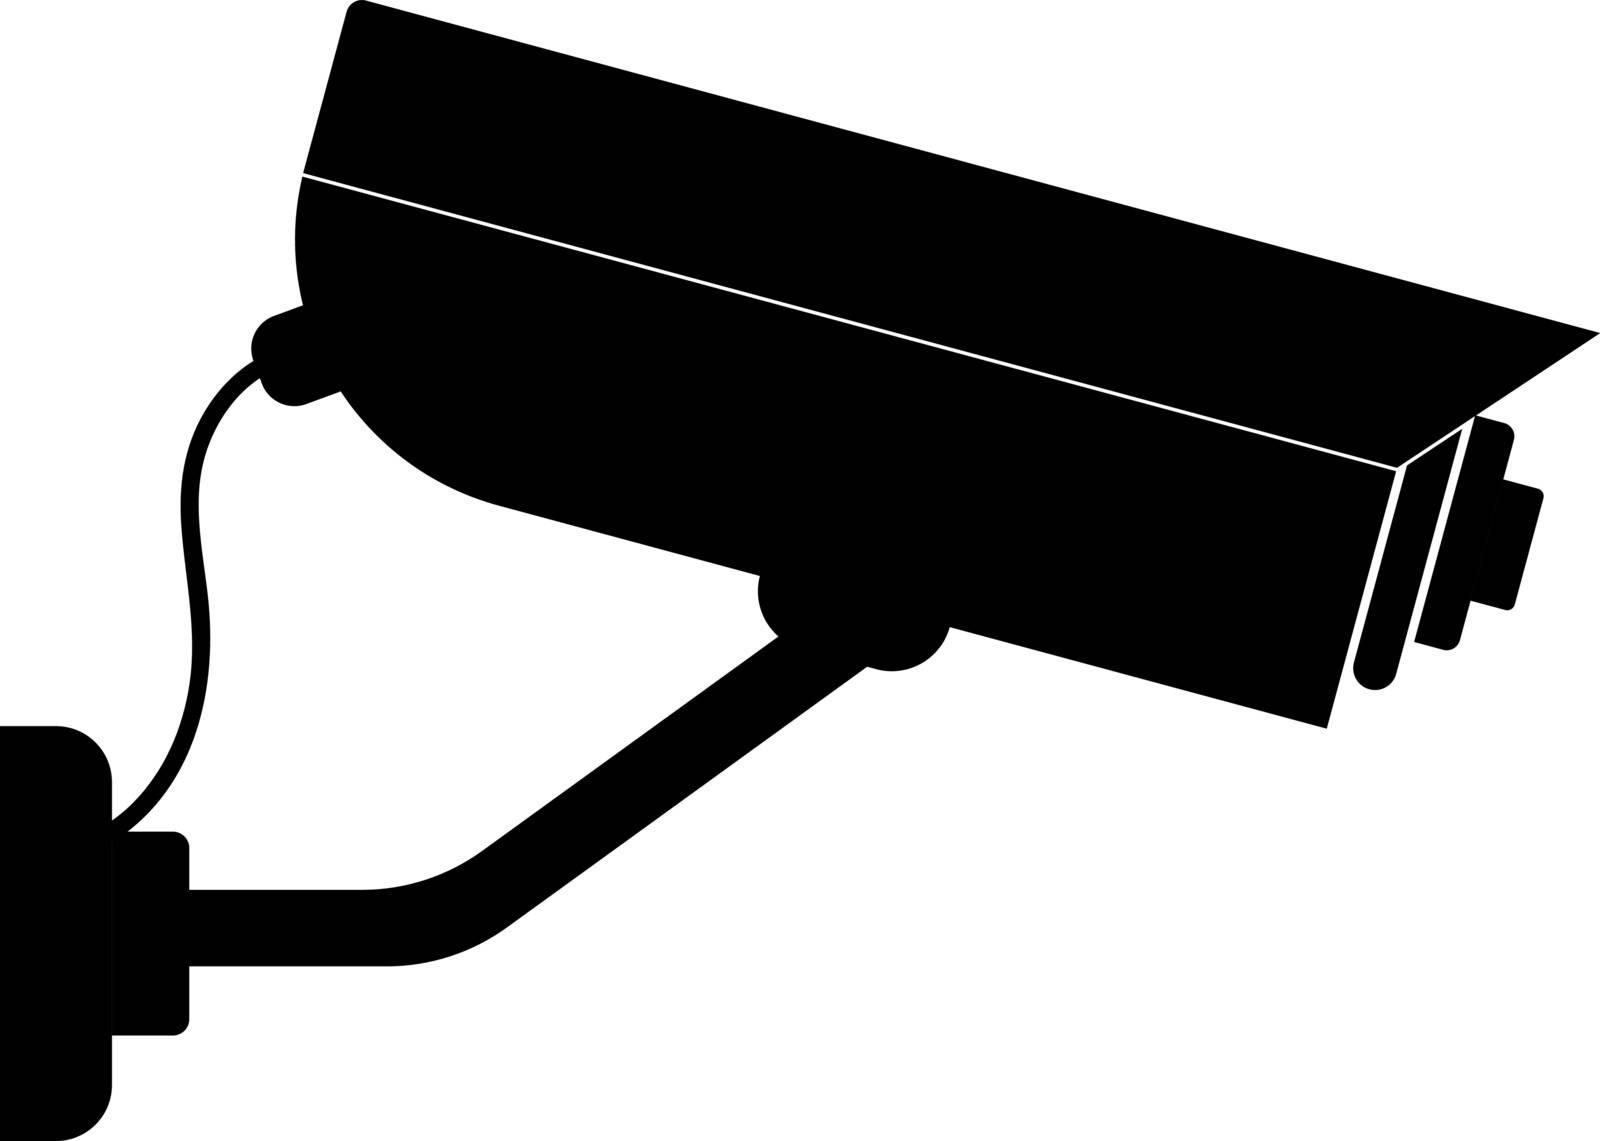 Illustration of video surveillance icon on white background